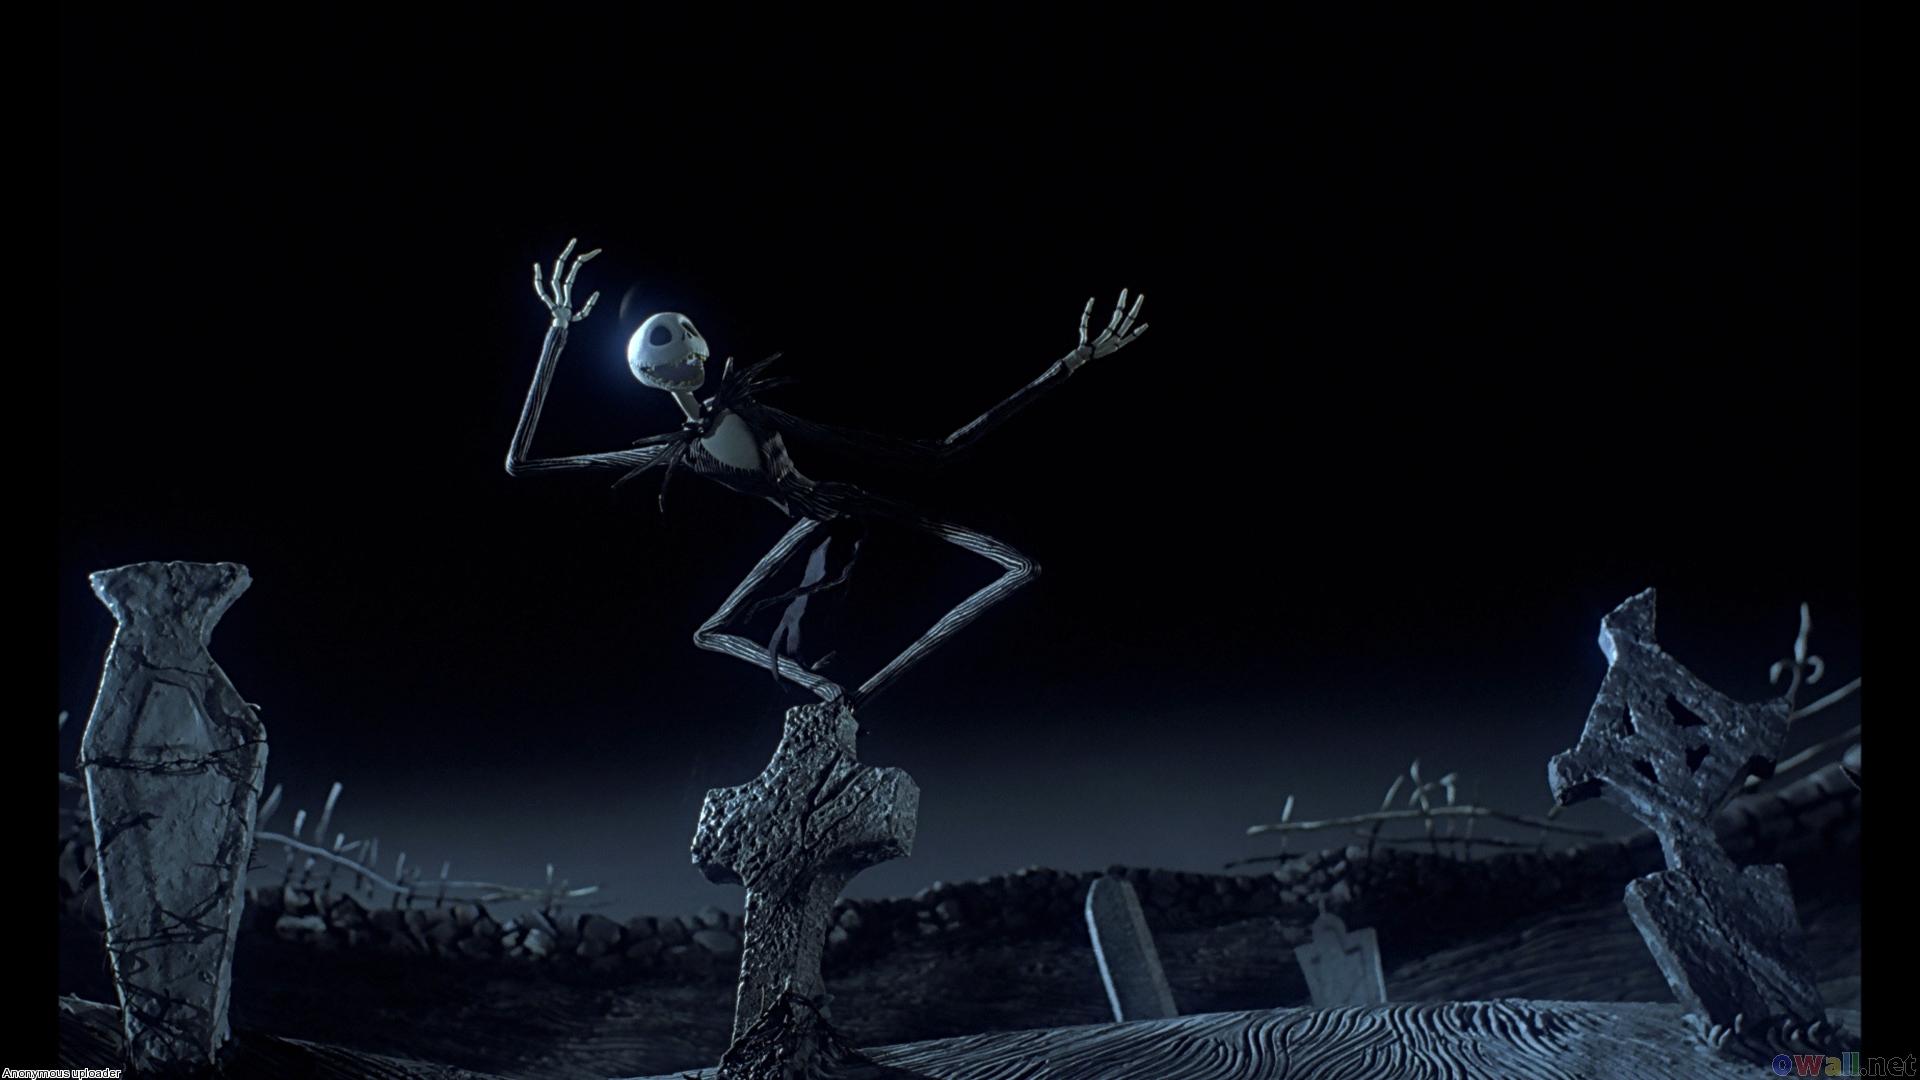 10 Best Nightmare Before Christmas Graveyard Background FULL HD 1920 ...